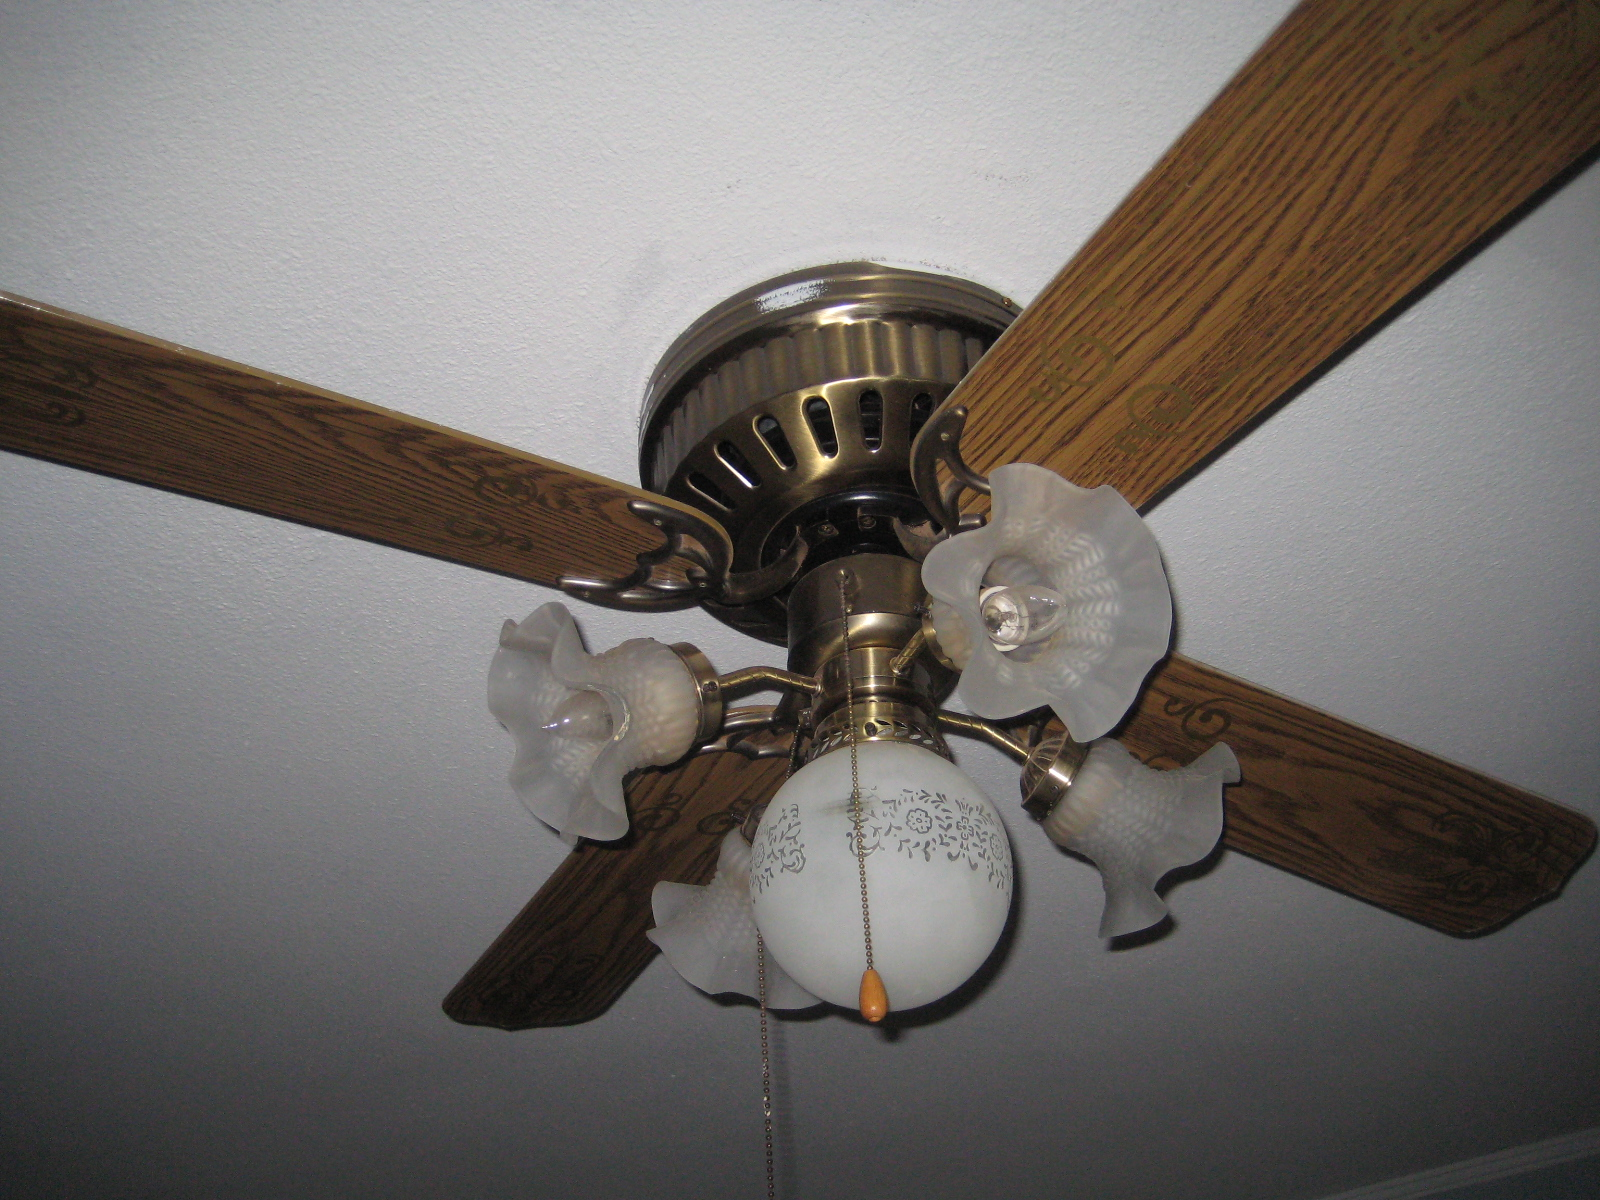 Adventures In Creating: Ceiling Fan Update